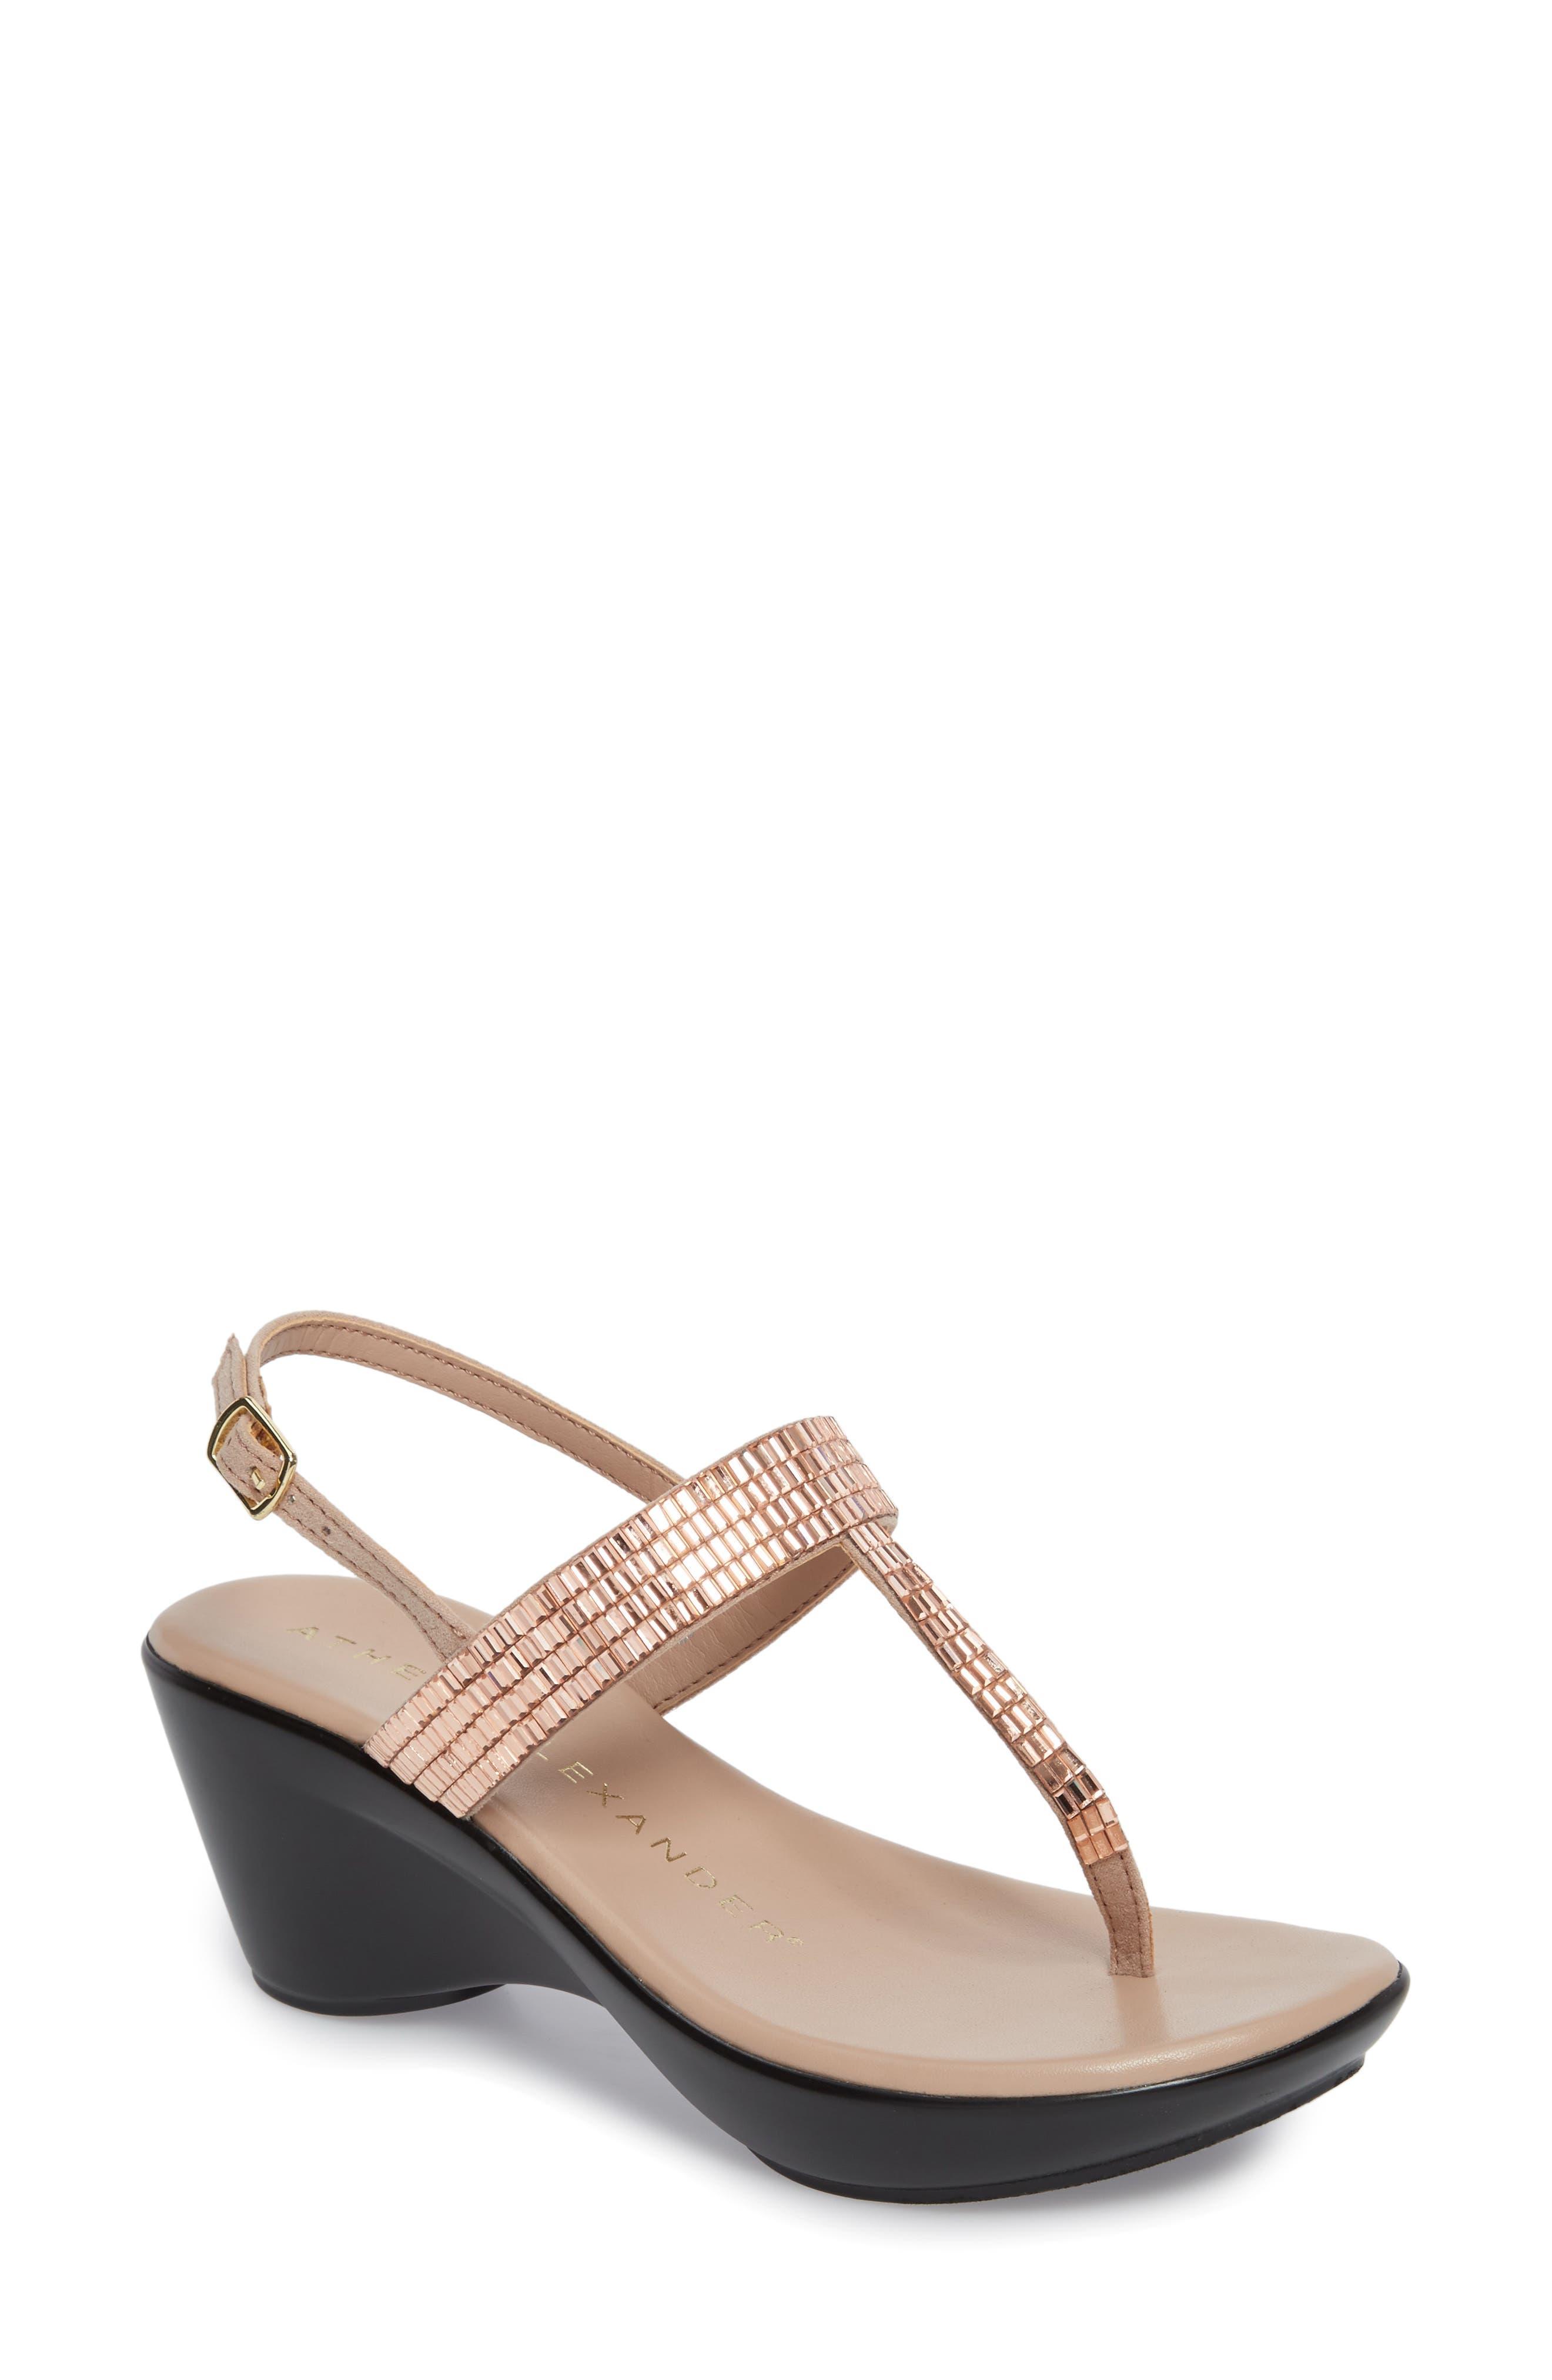 Main Image - Athena Alexander Dakkota Wedge Sandal (Women)